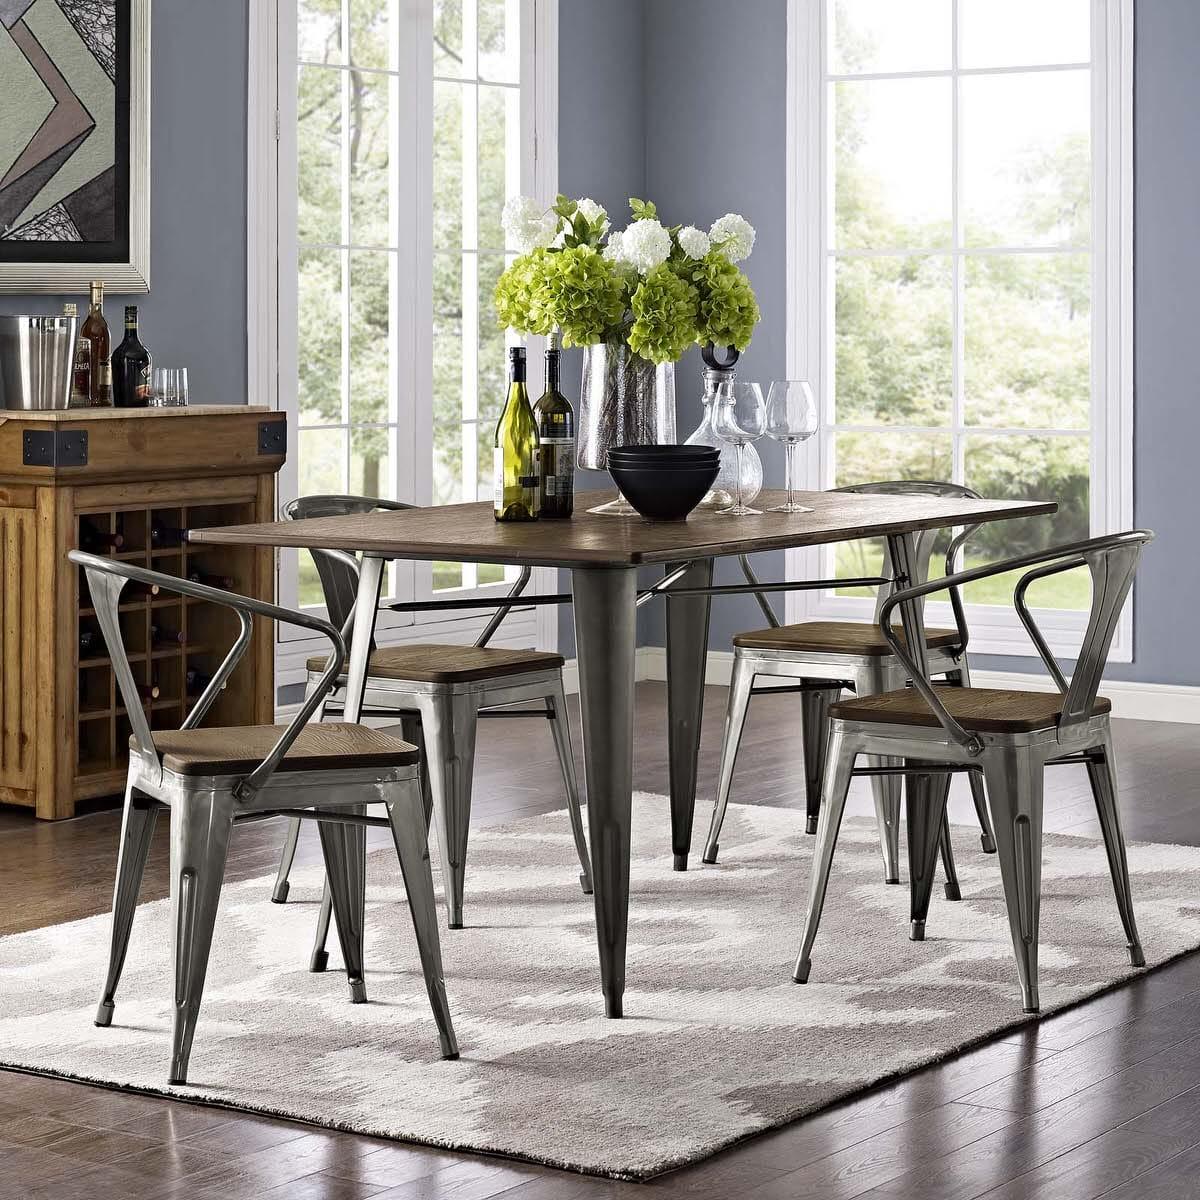 bamboo dining chair aluminum webbing promenade set of 4 gunmetal by modern living